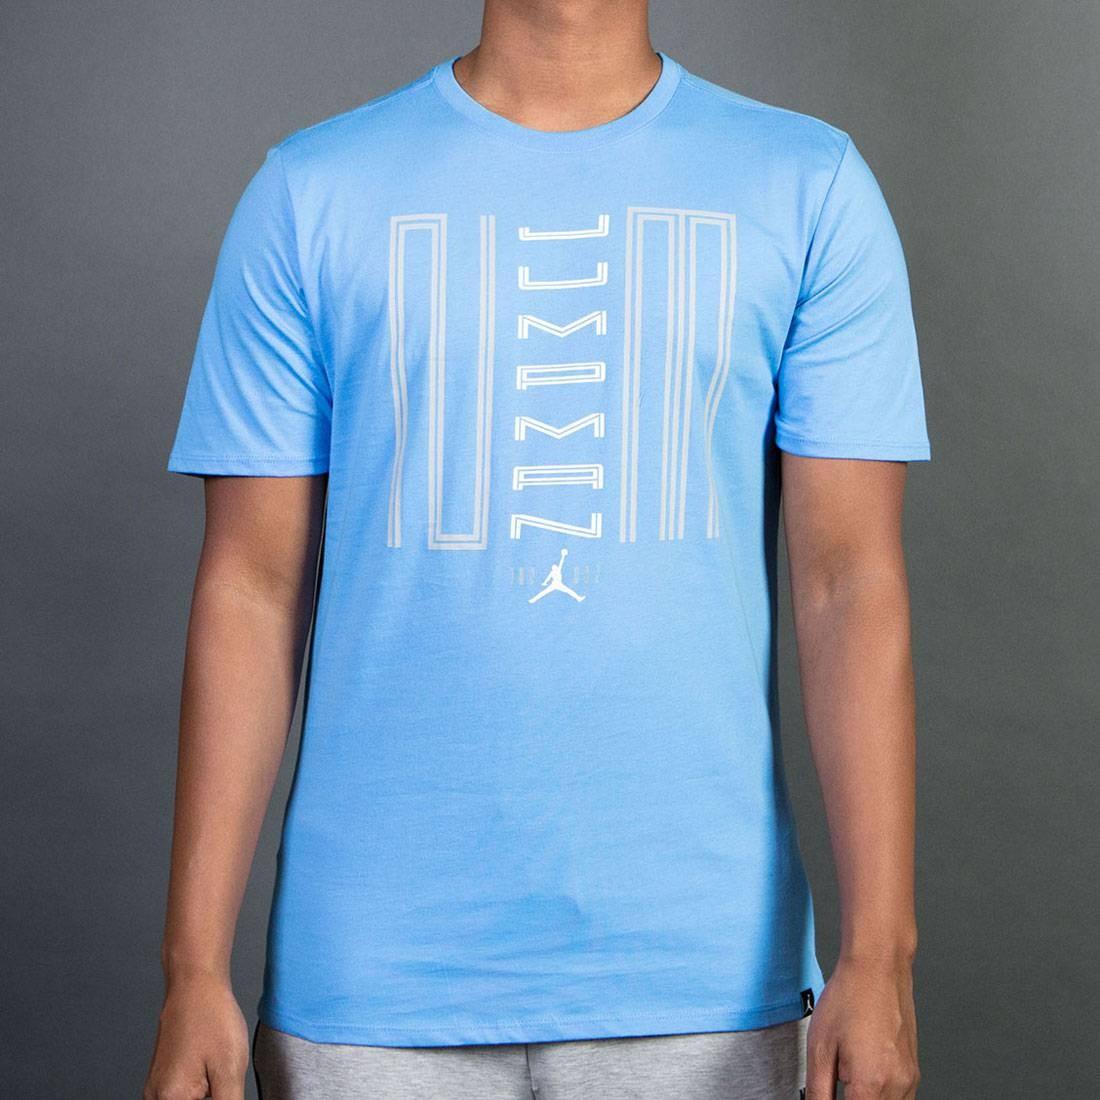 Air Jordan 11 Jumpman 23 Tee Men (blue / university blue / white)